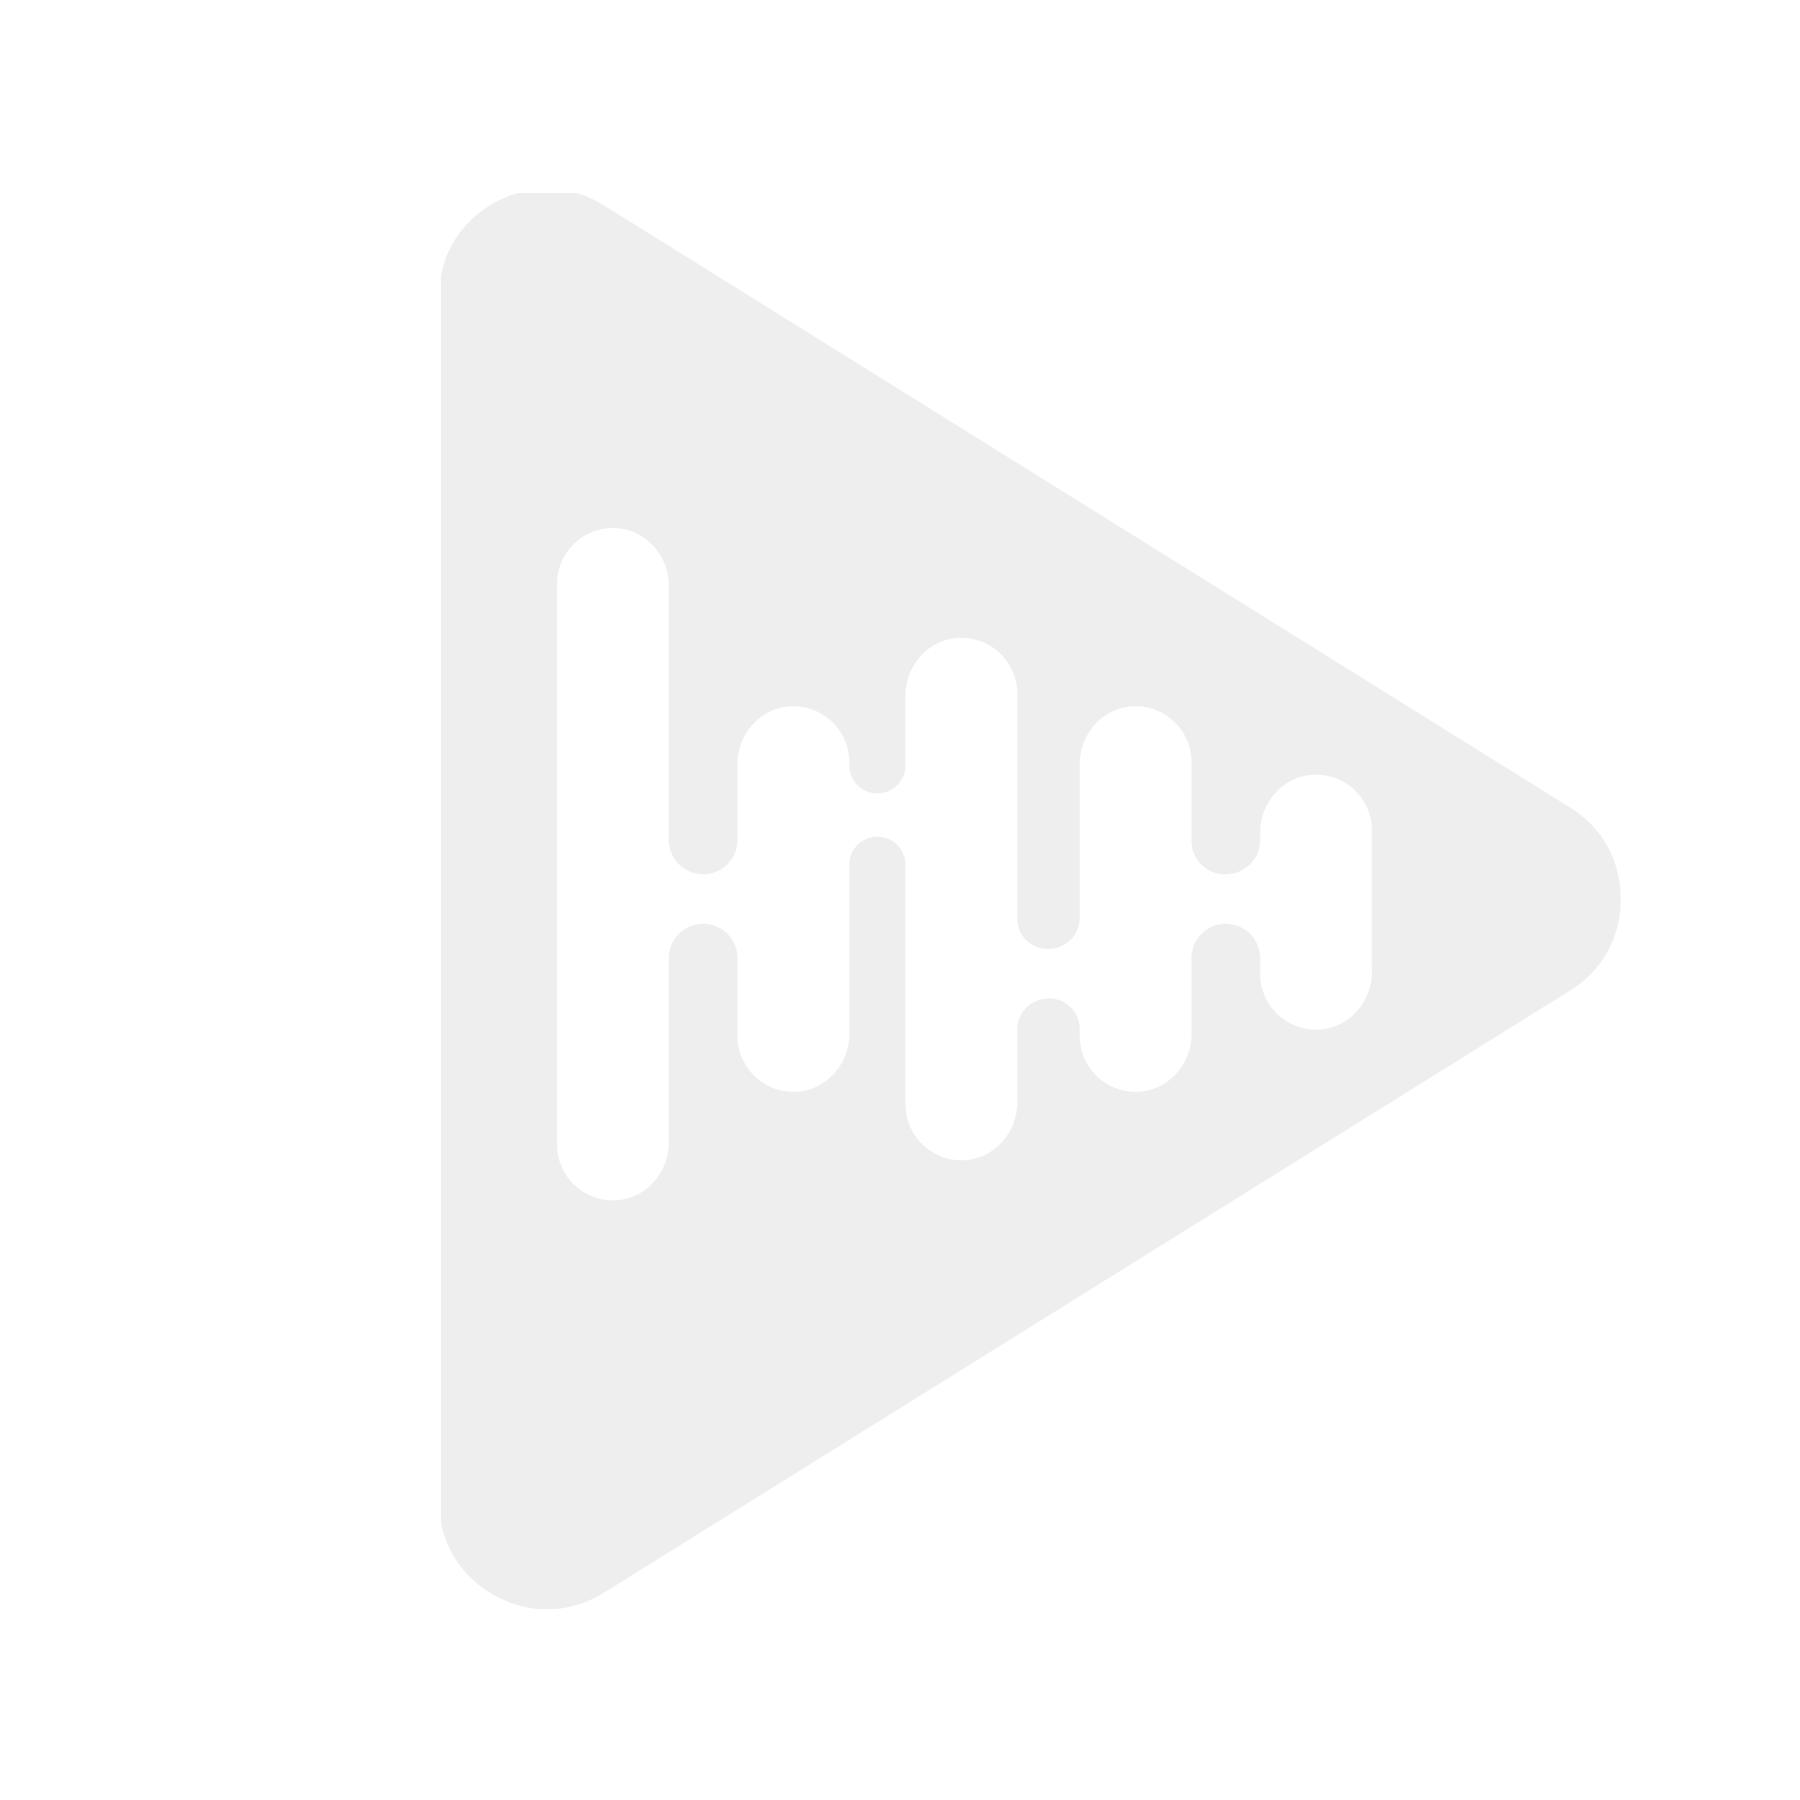 Audison APBMW-F21-HIFI